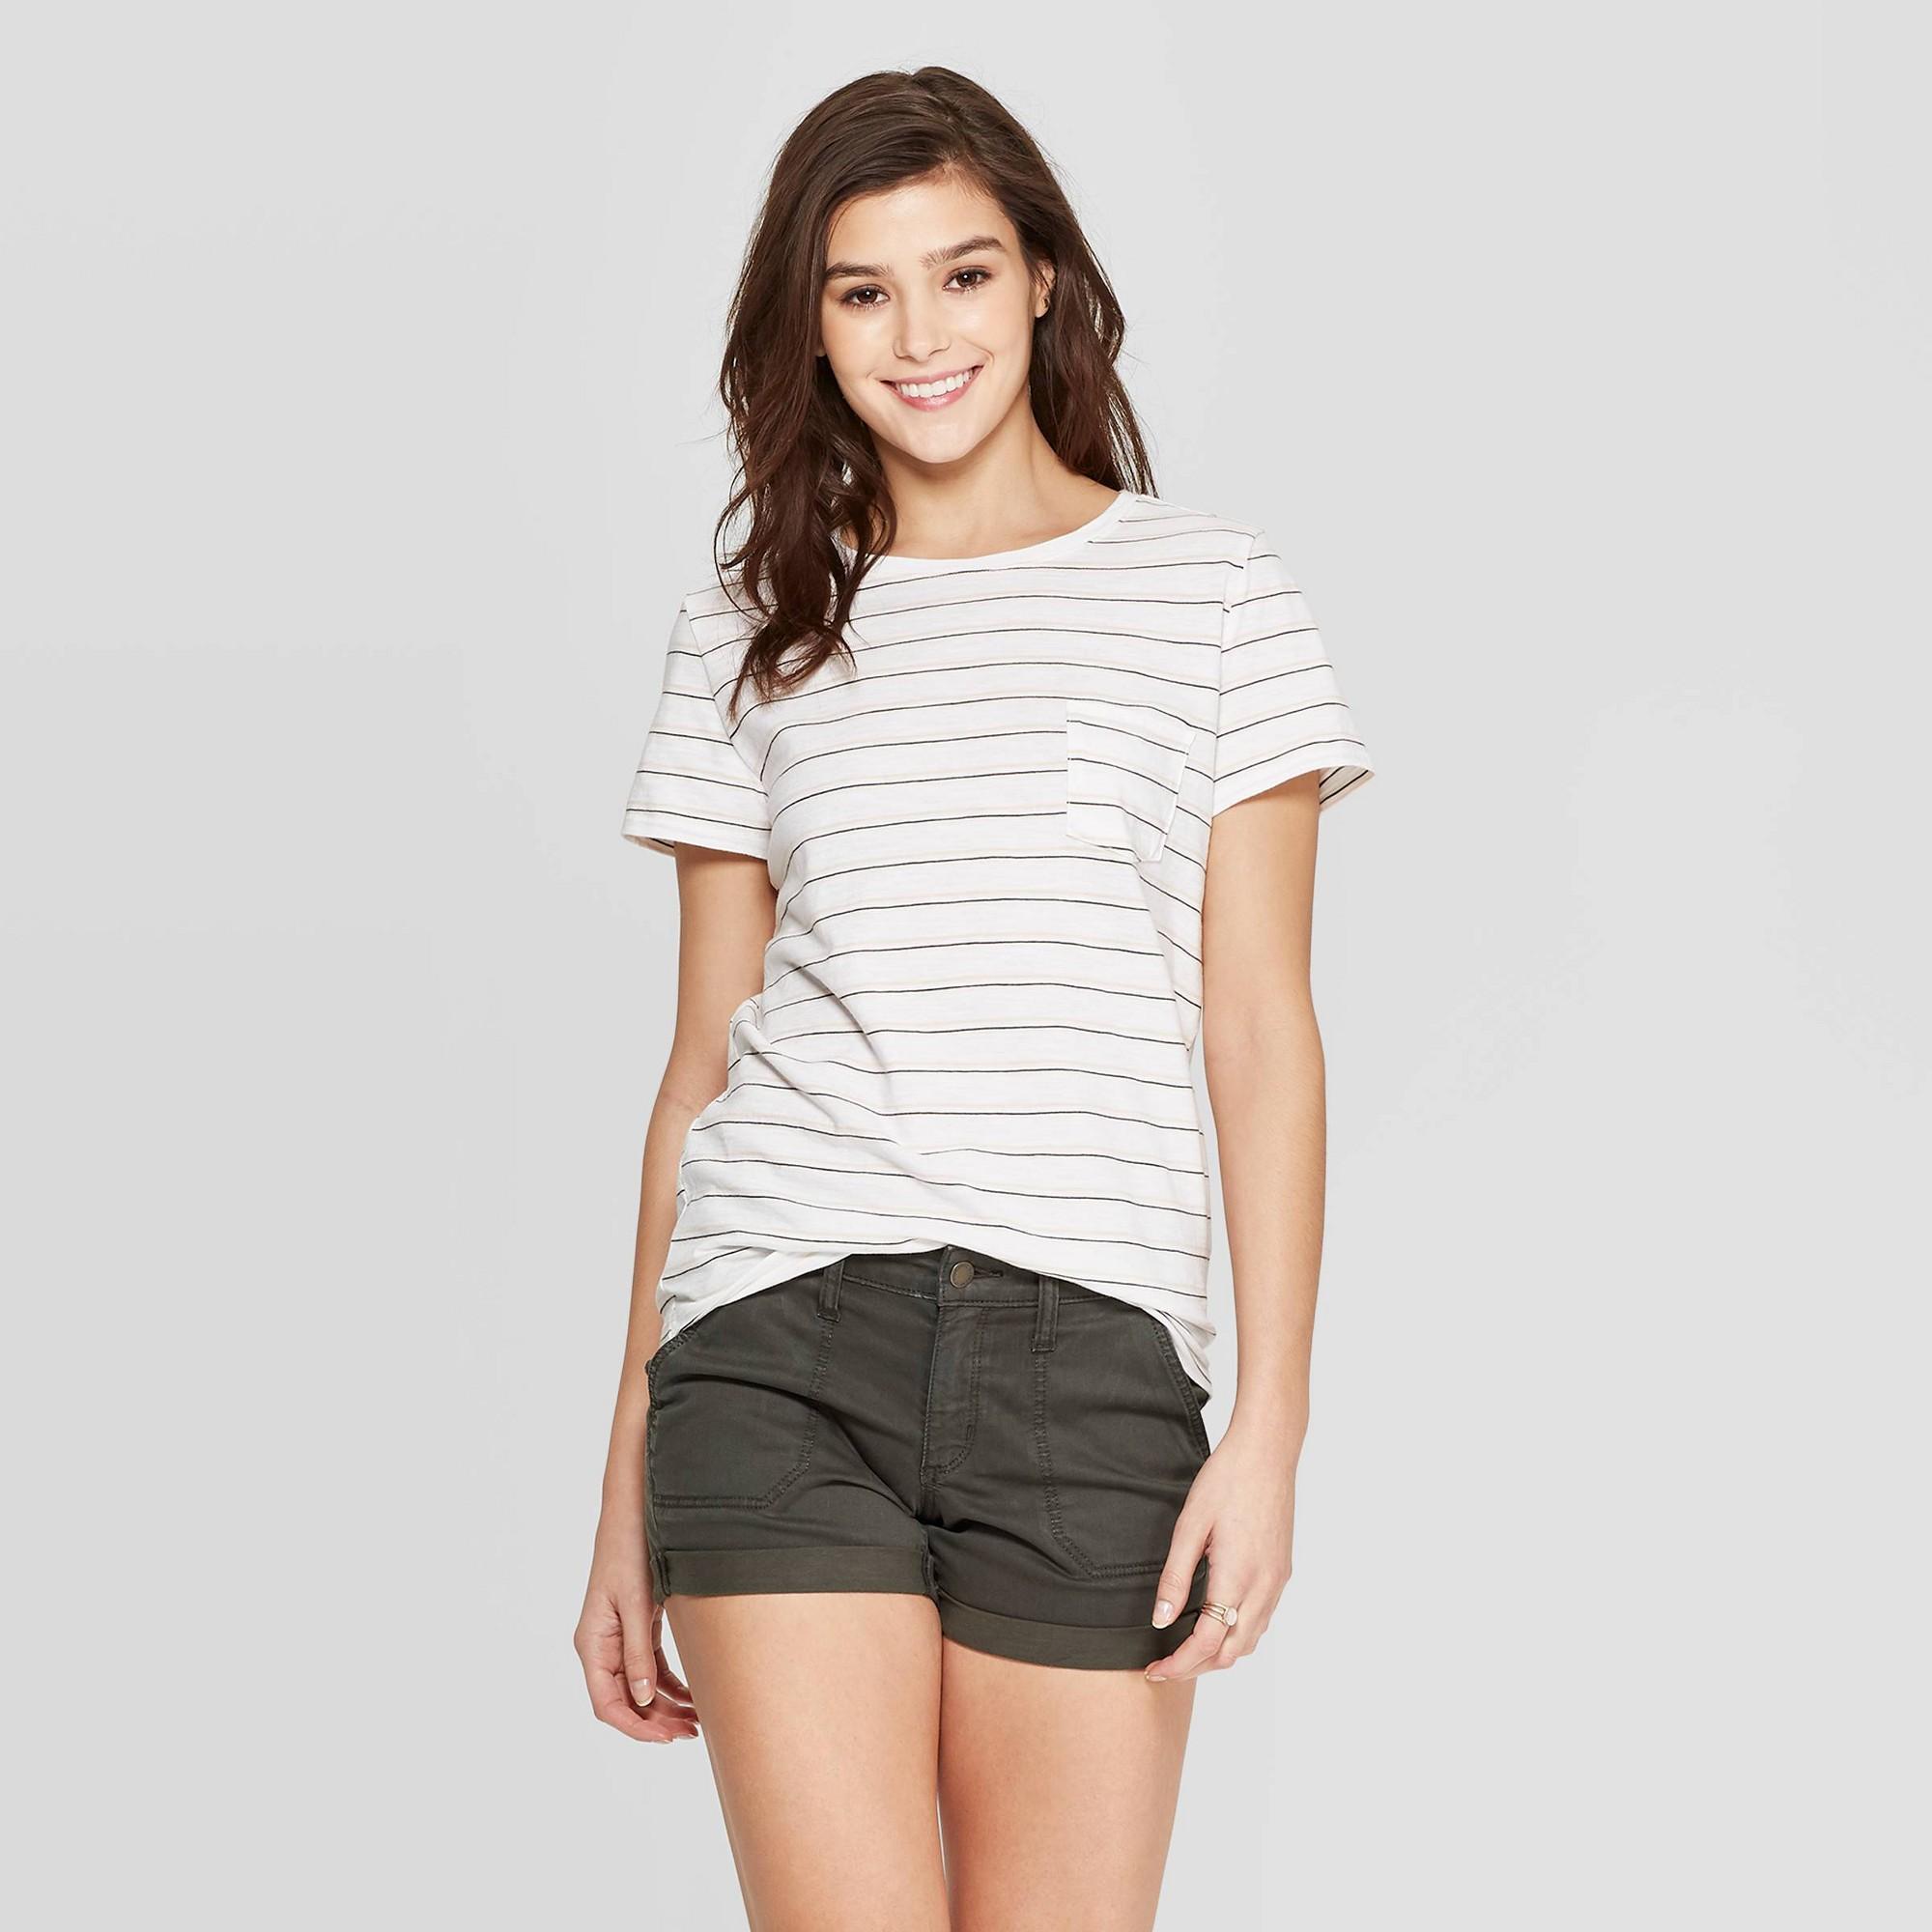 Women's Striped Crewneck Relaxed Fit Short Sleeve T-Shirt - Universal Thread White XL, Beige